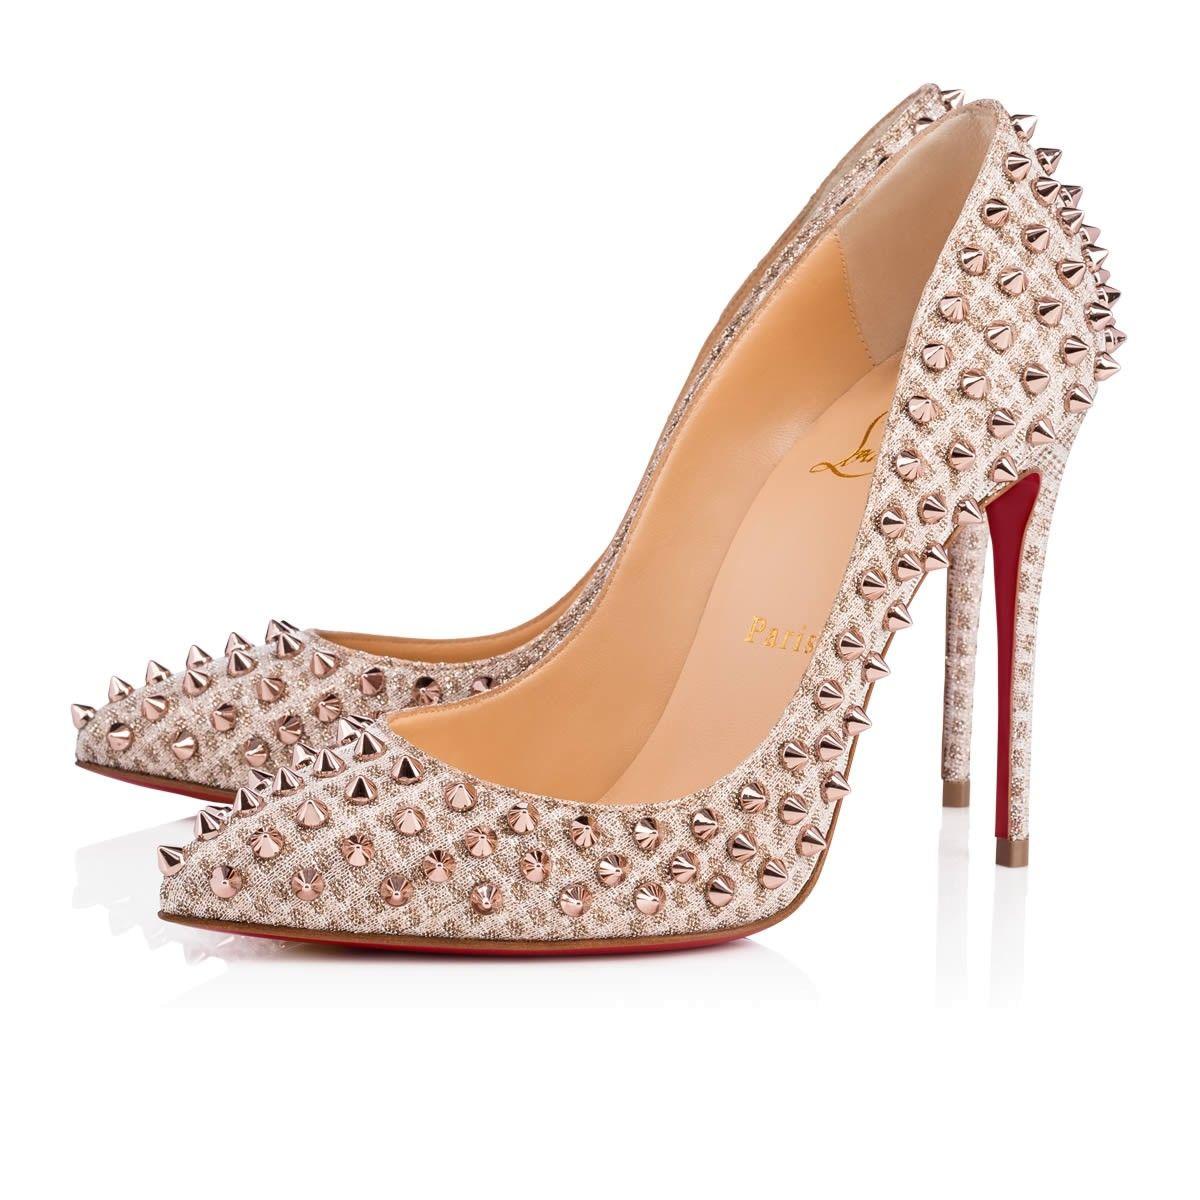 14f6e26e035 CHRISTIAN LOUBOUTIN Follies Spikes. #christianlouboutin #shoes ...